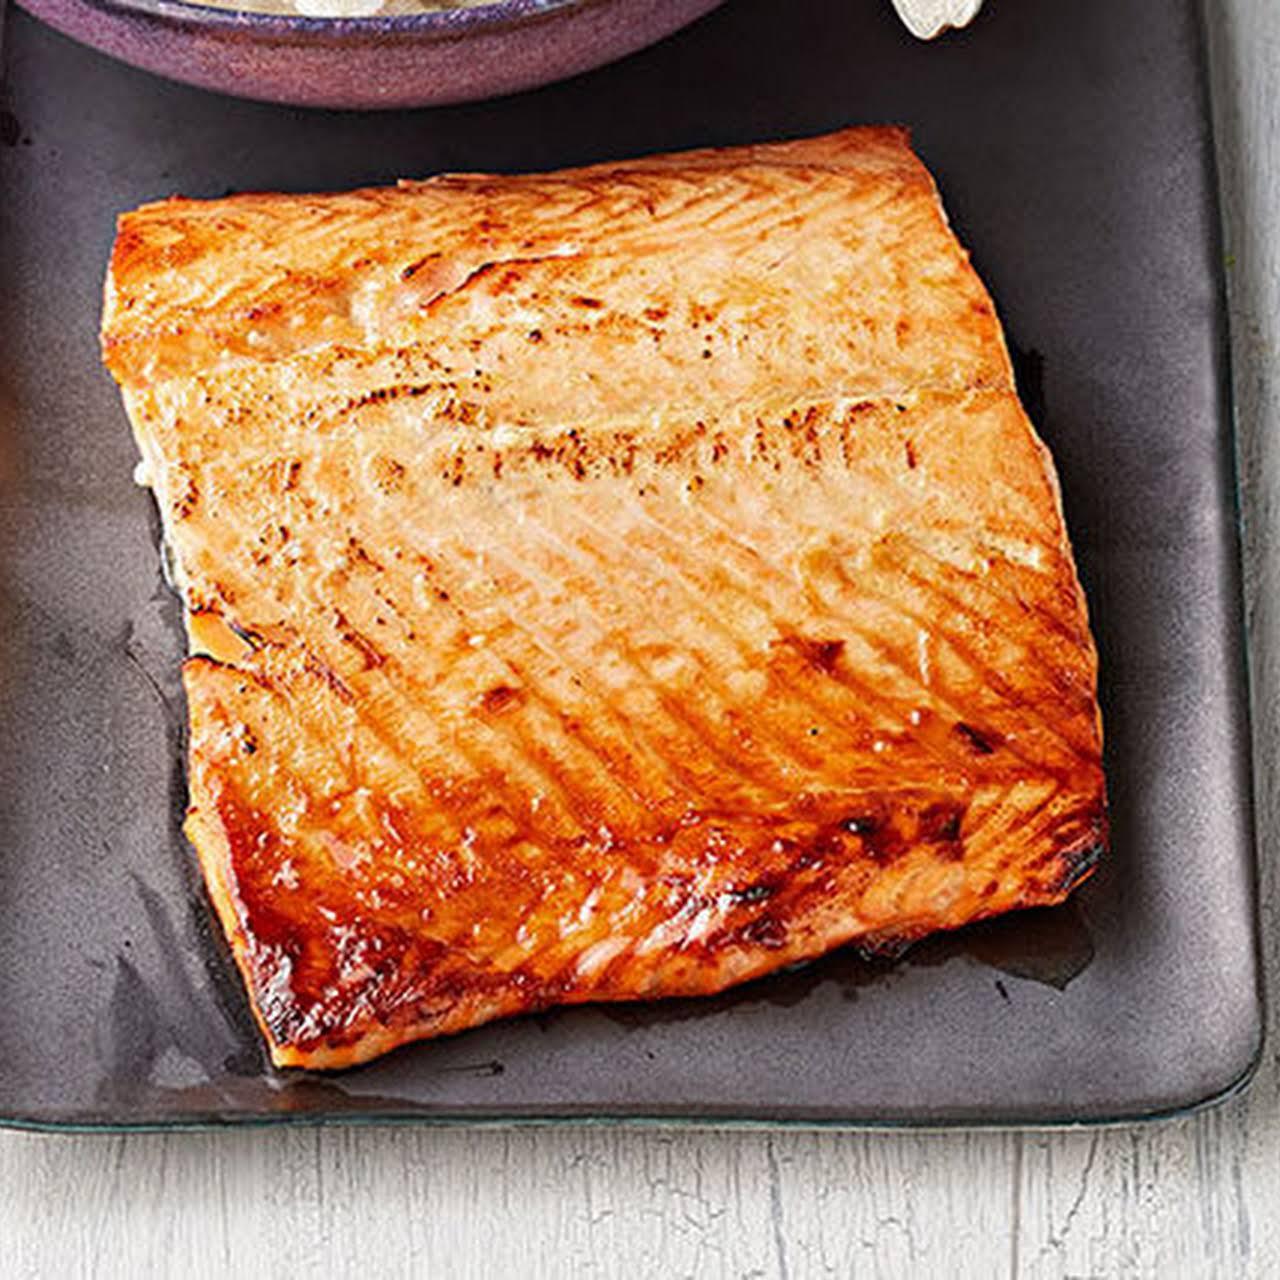 Honey-Dijon Salmon with Creamy Cauliflower Mash